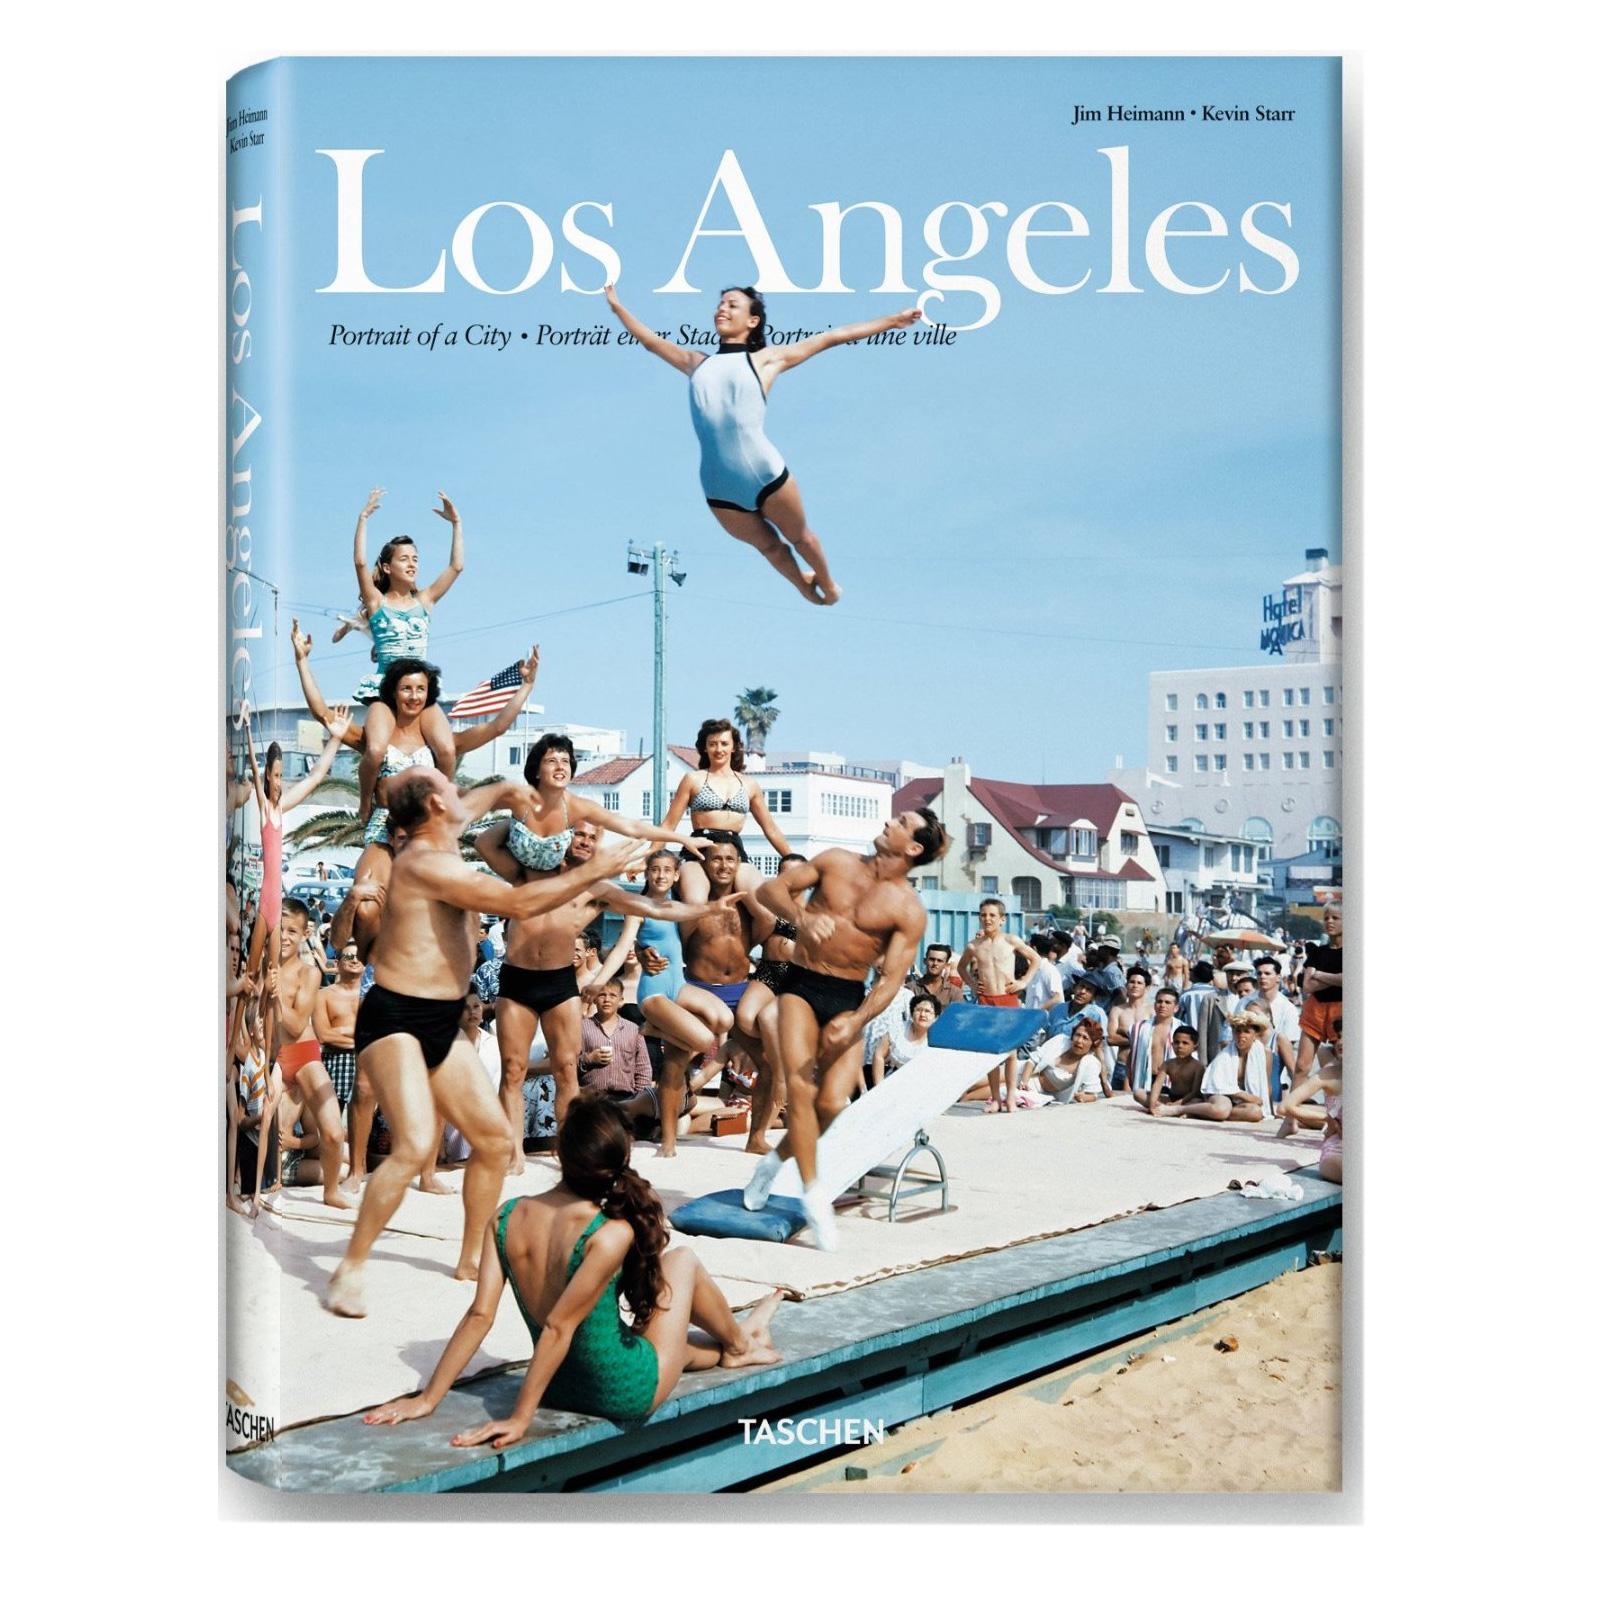 Los Angeles, Portrait of a City - Book